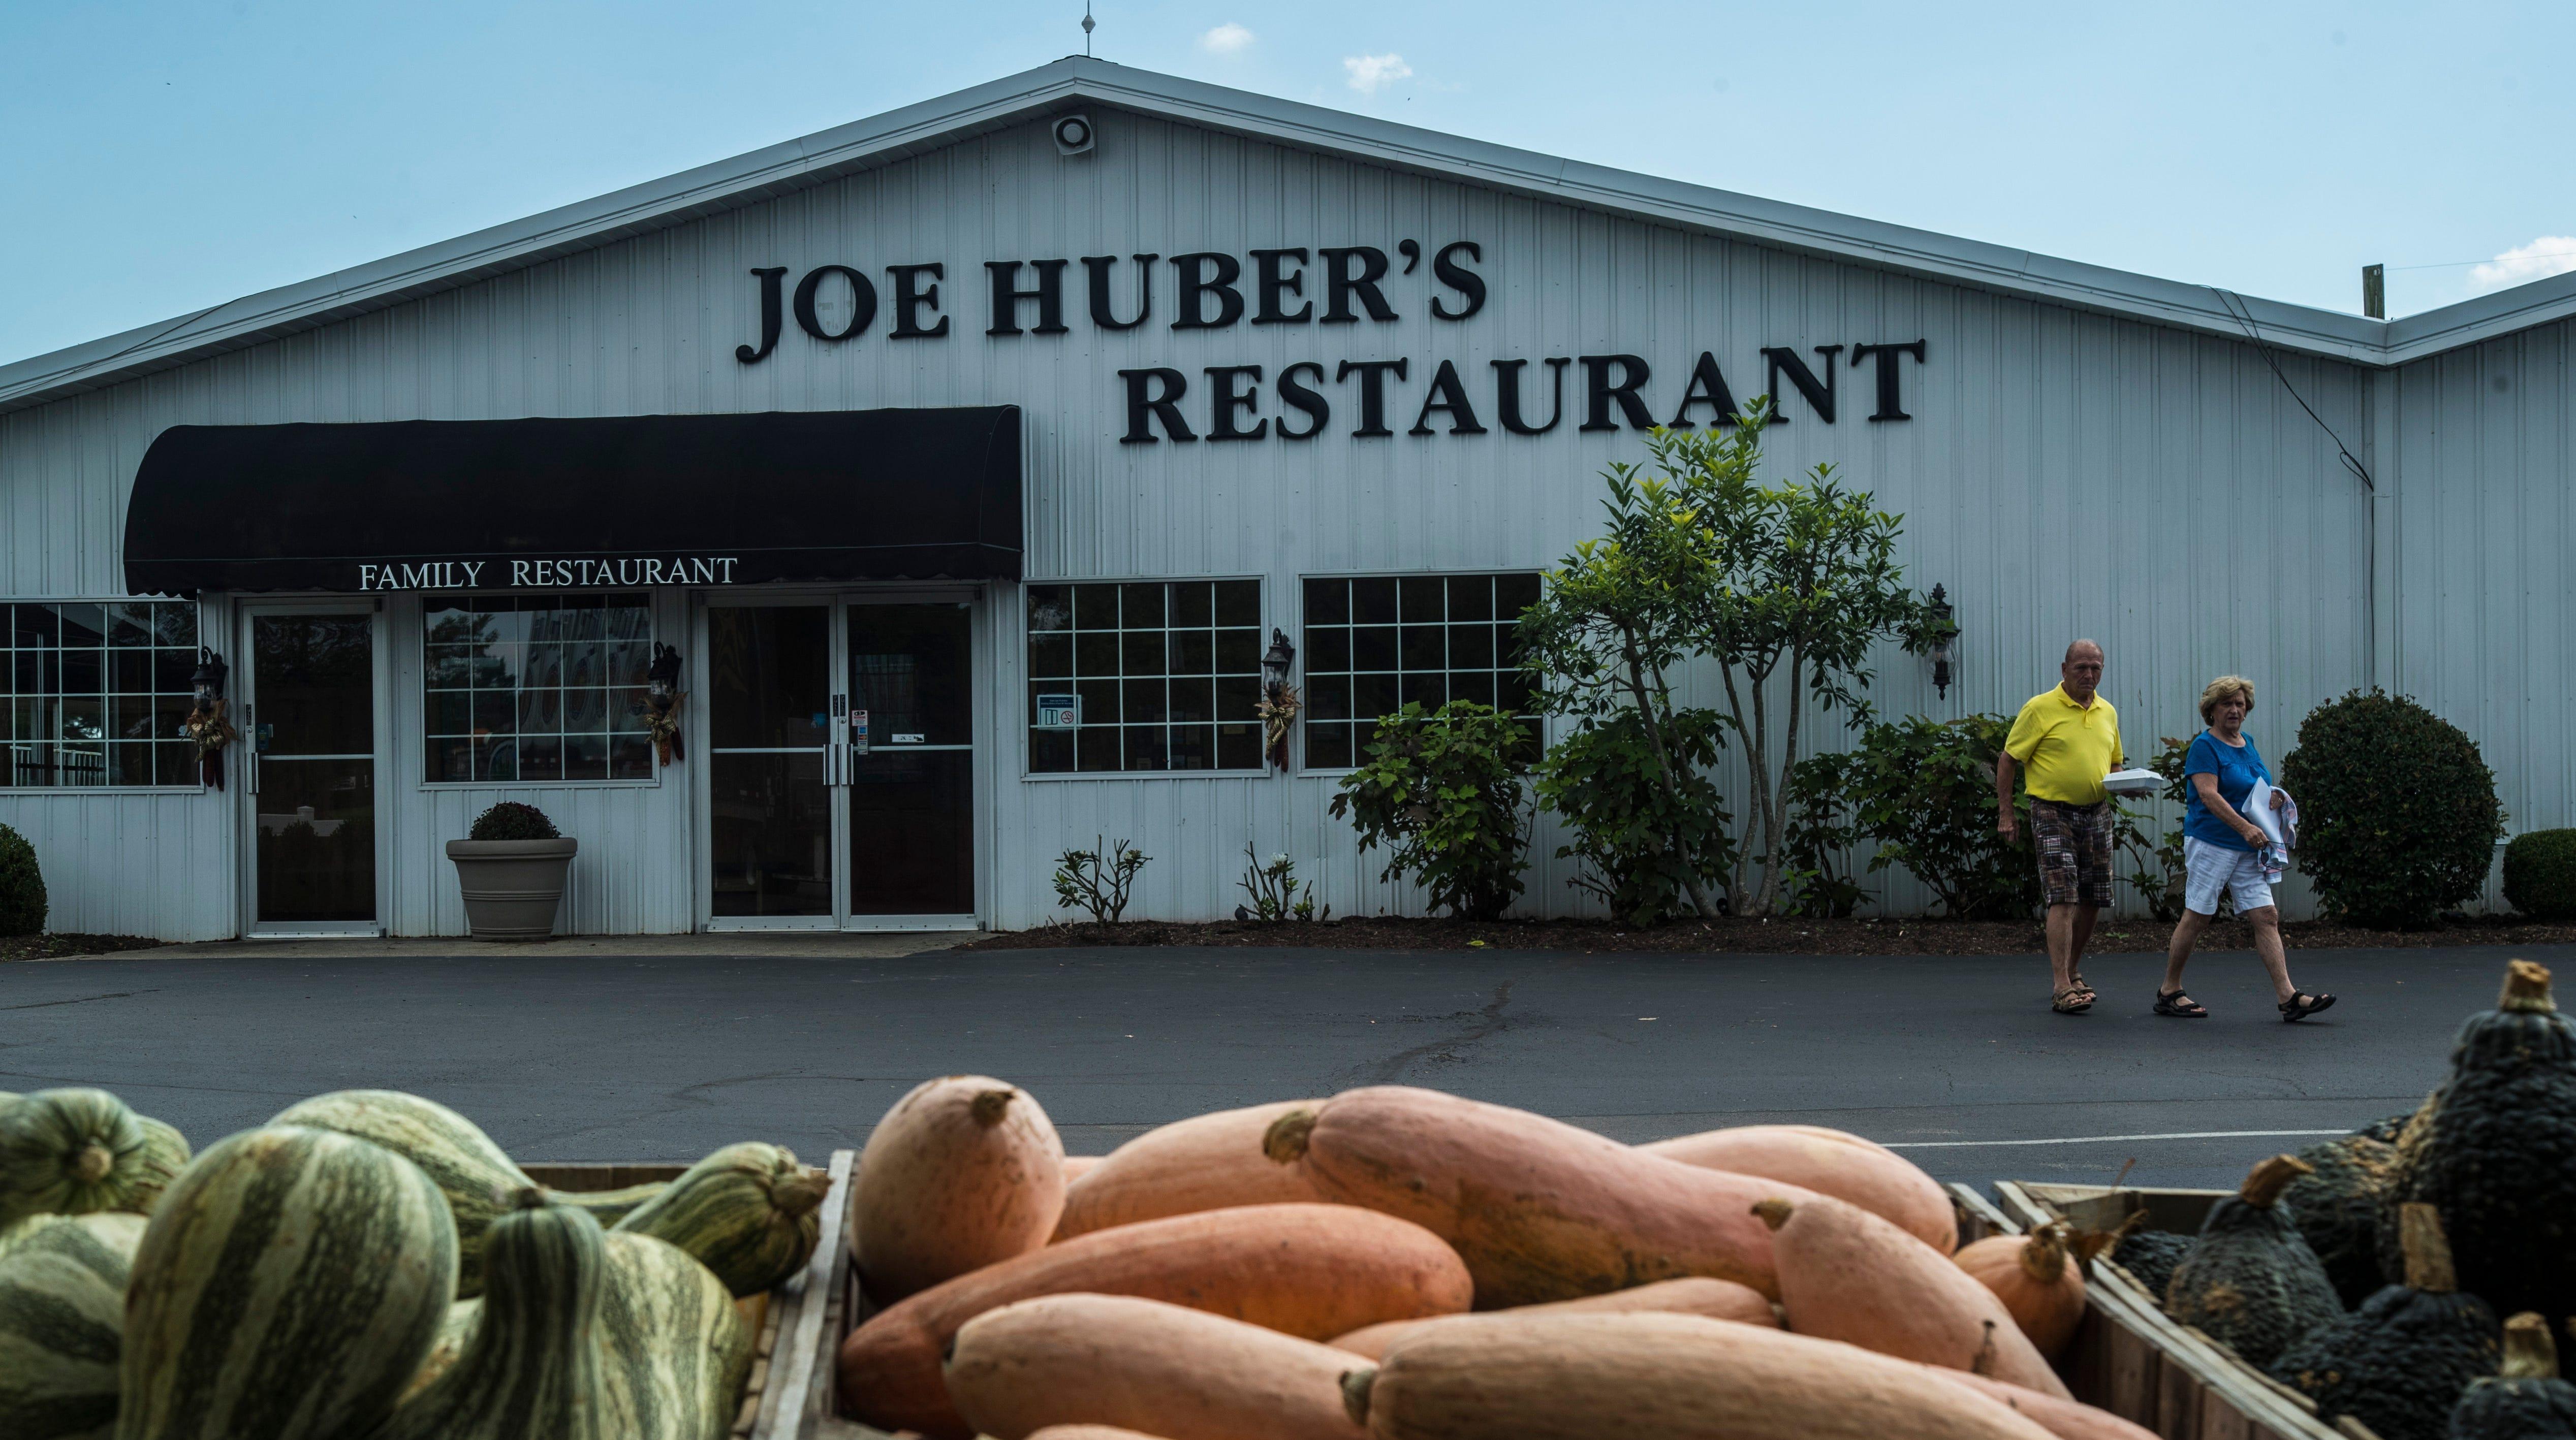 Joe Huber's fundraising draws $13,500 to help family members save farm